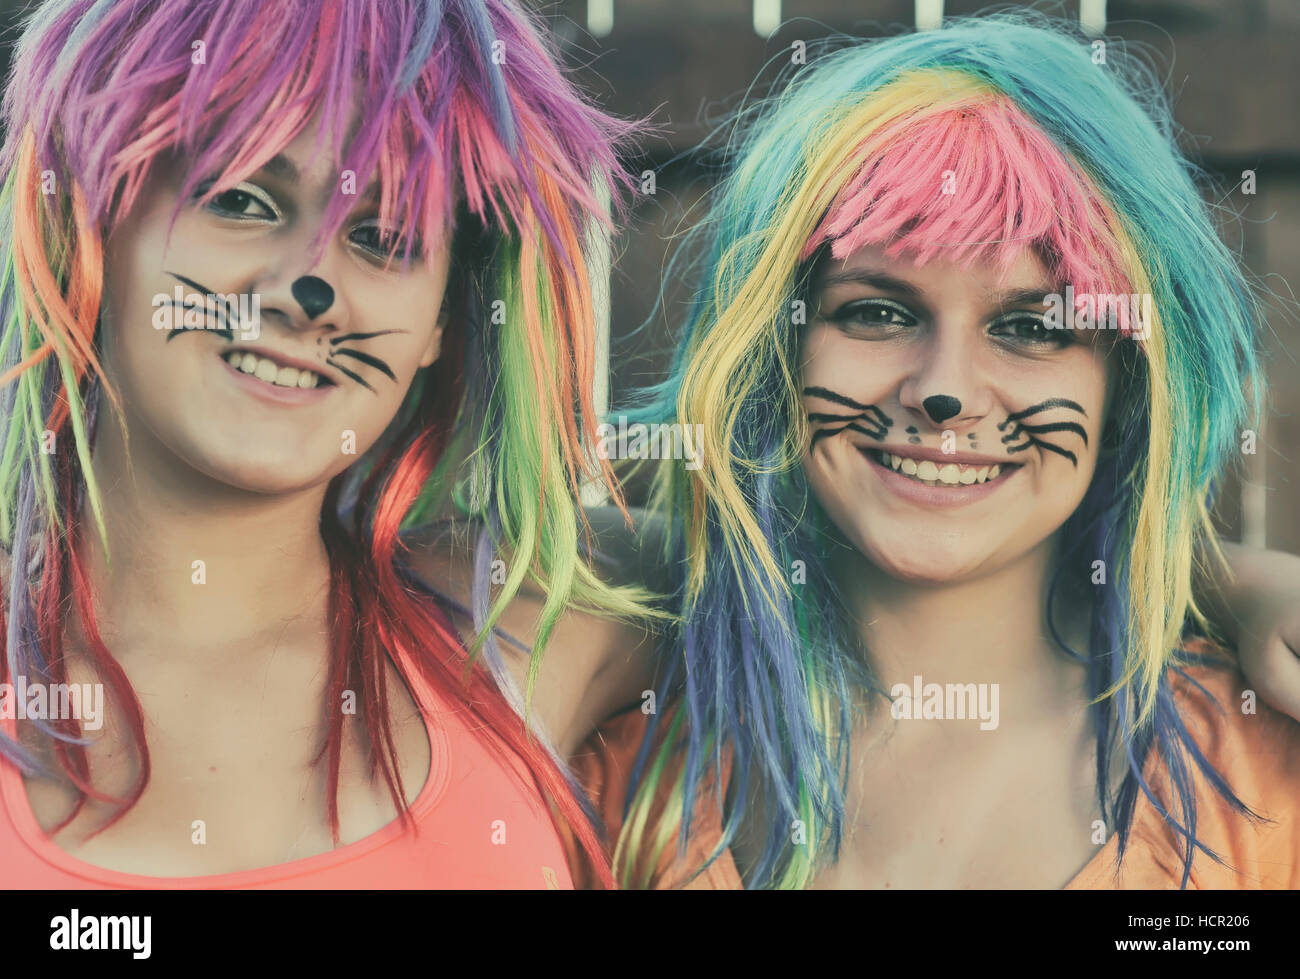 Mädchen mit Kinderschminken Stockbild